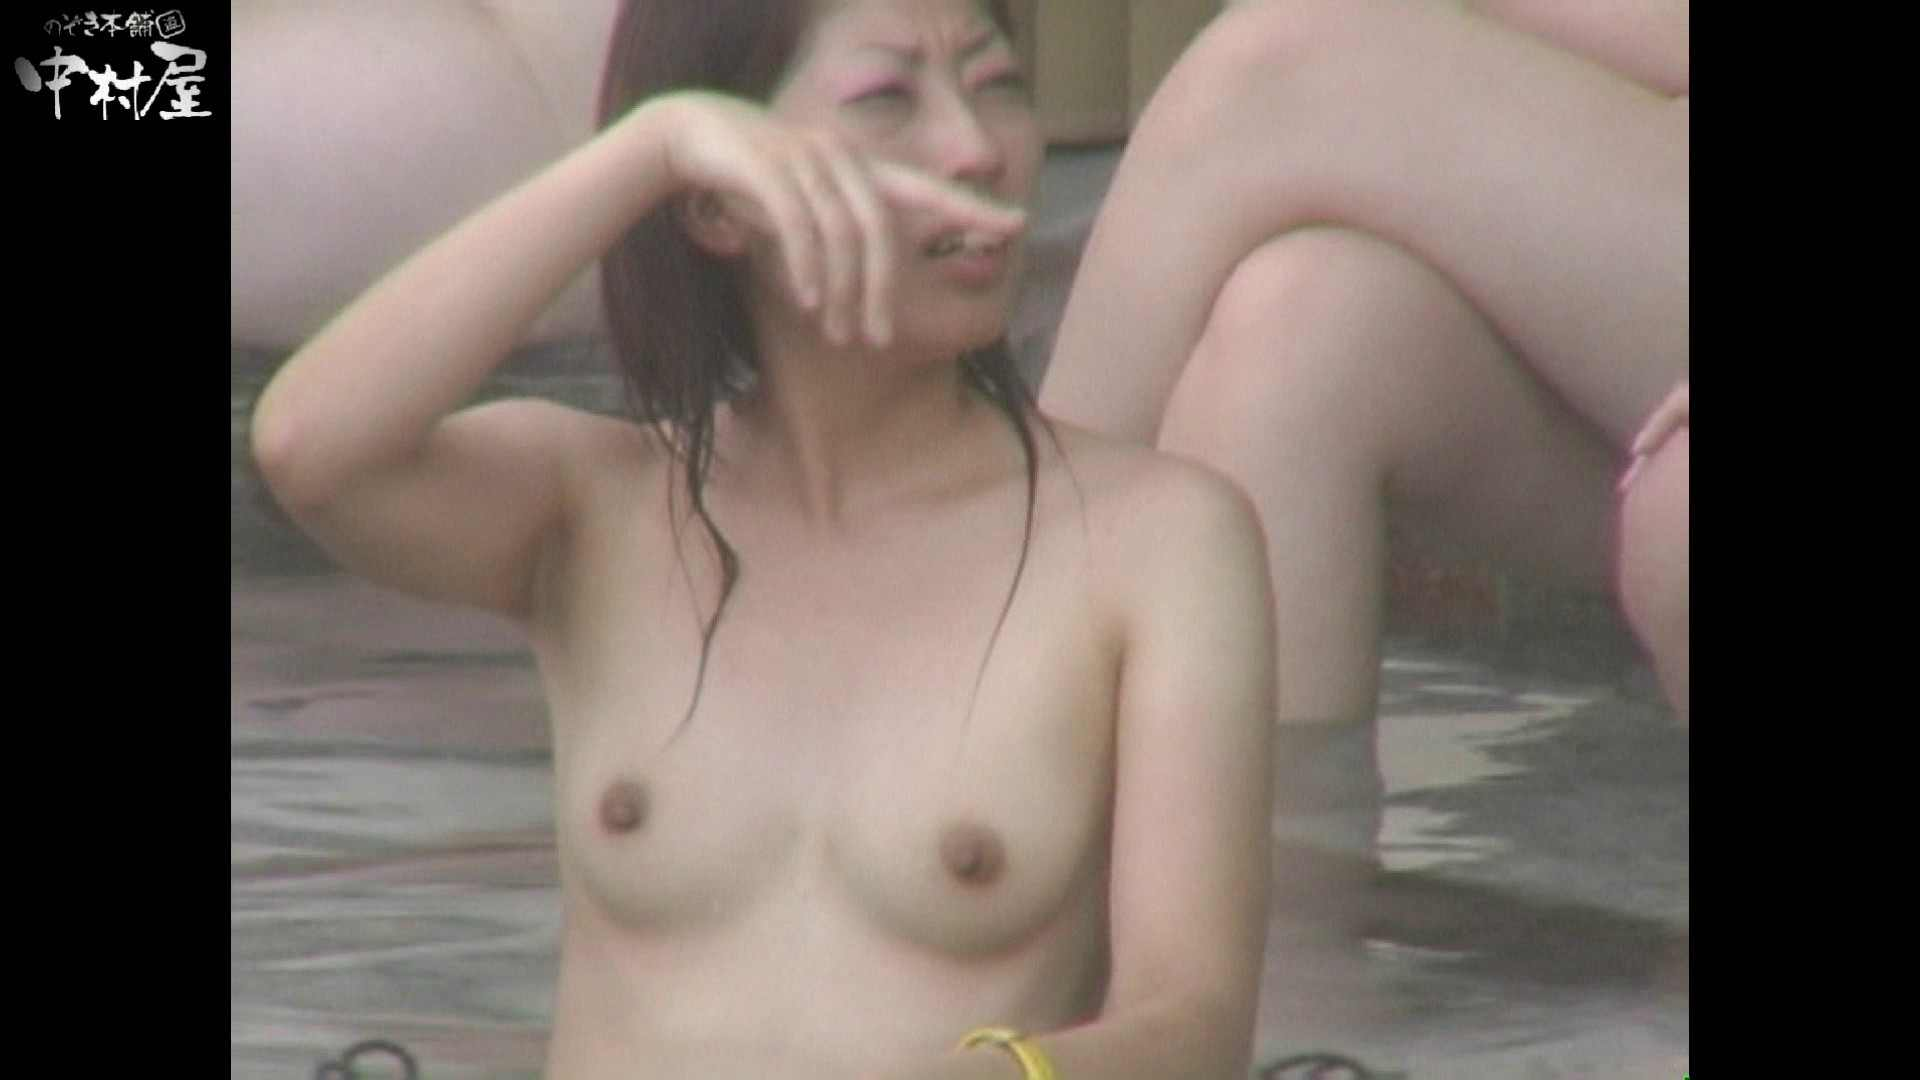 Aquaな露天風呂Vol.940 盗撮  47連発 12